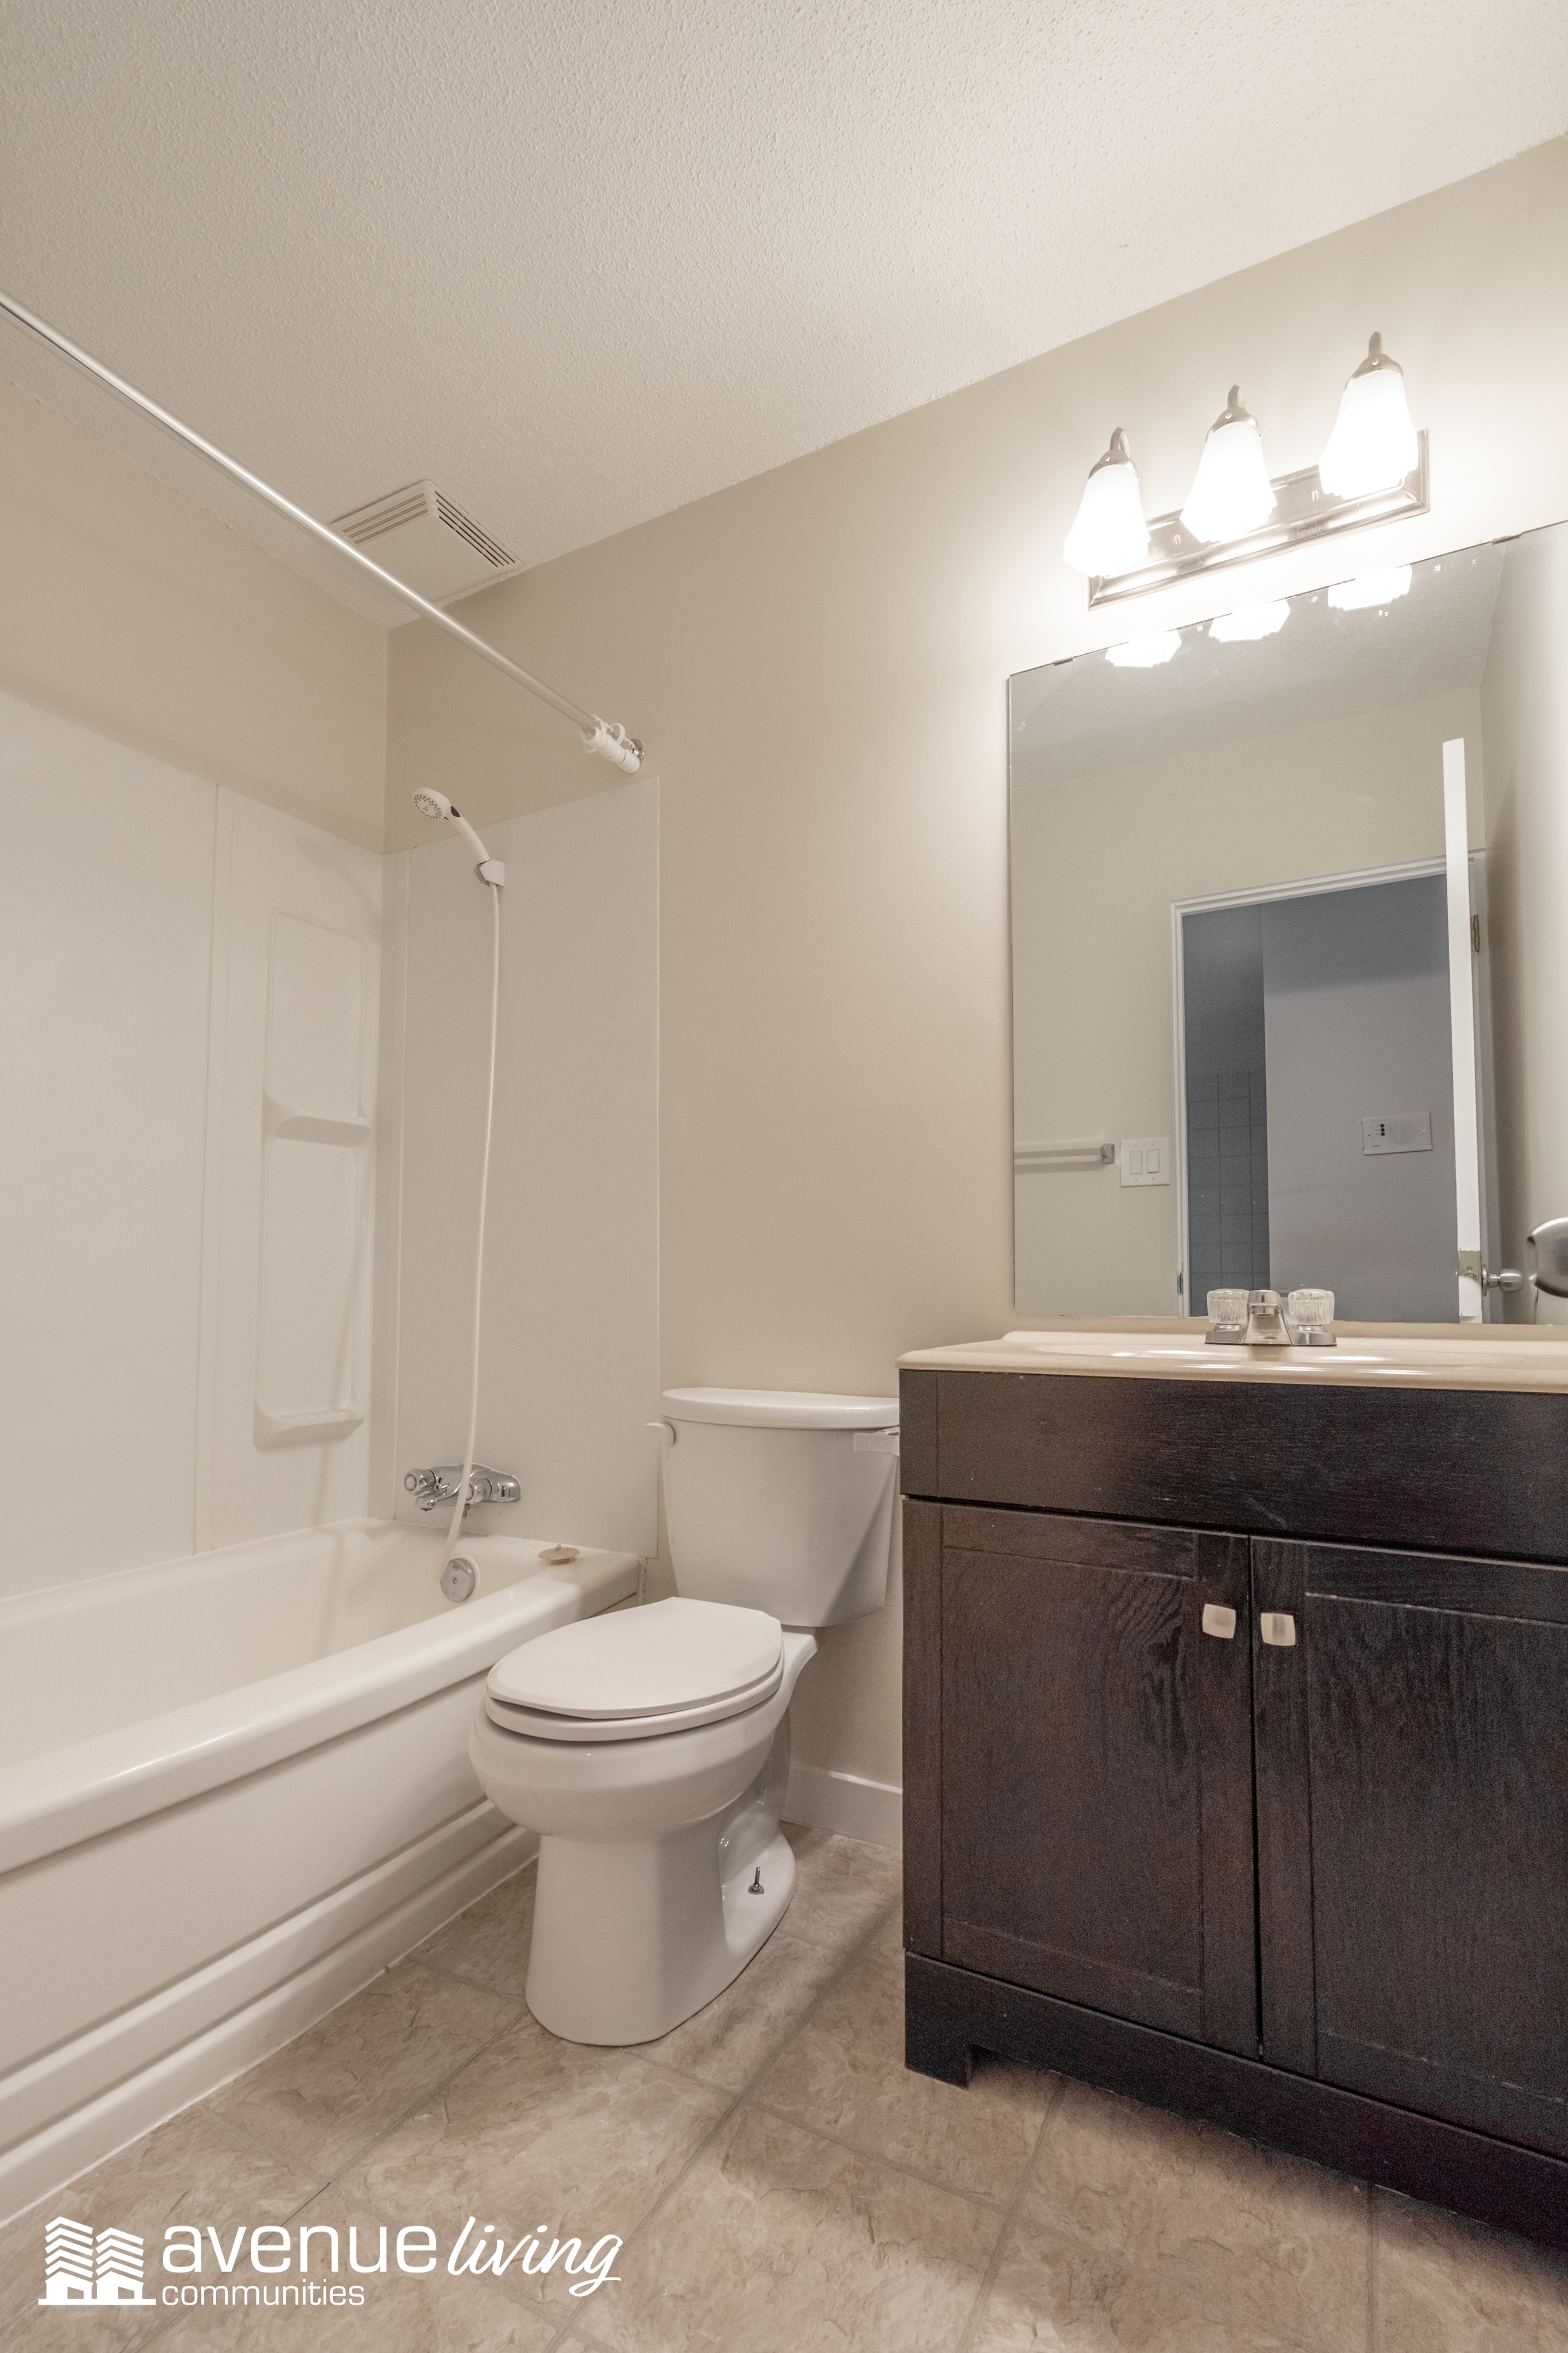 Cloverdale Apartments For Rent In Edmonton Avenue Living